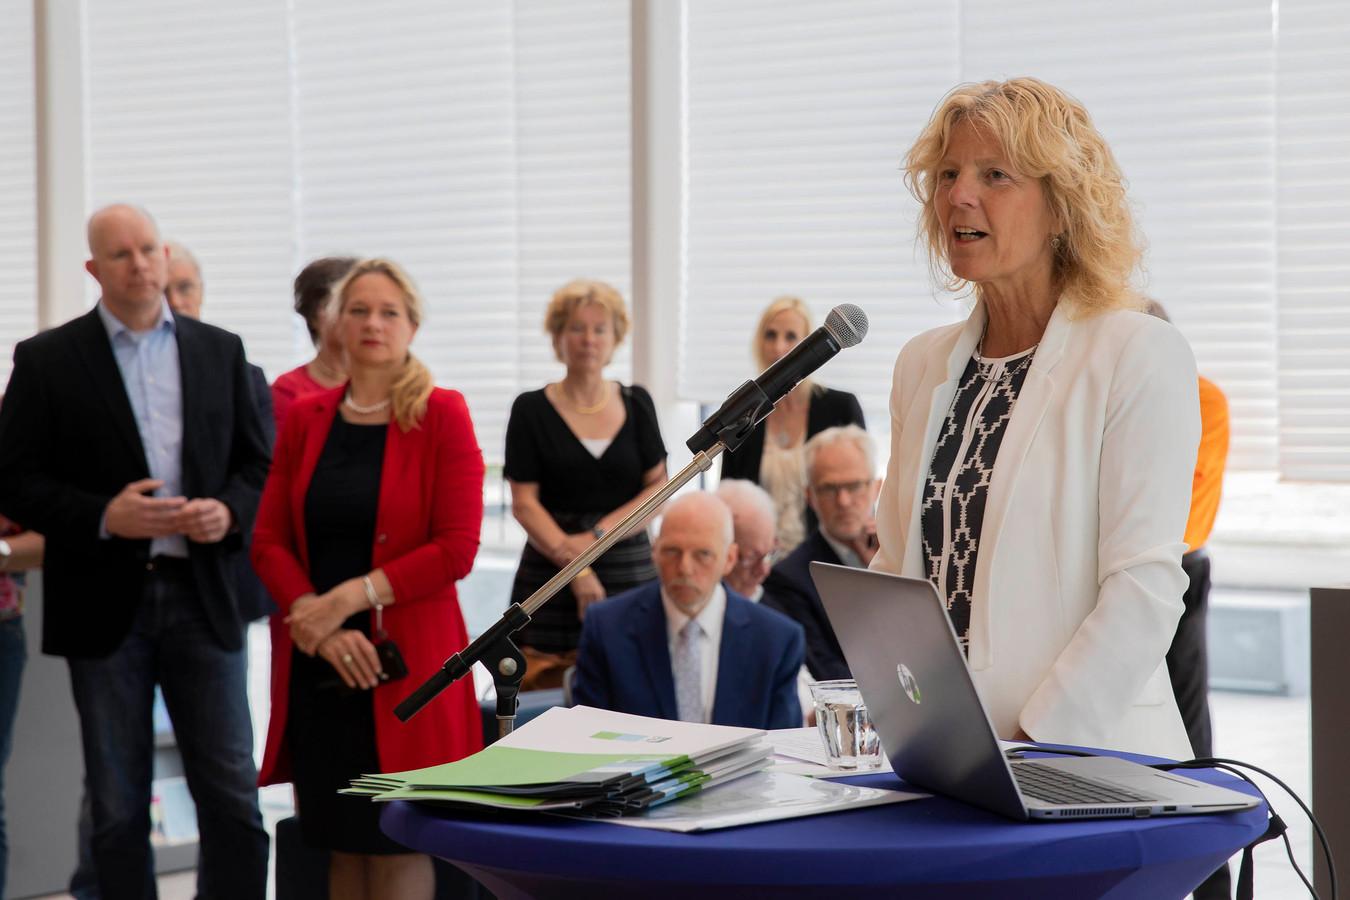 Karin Zwinkels beëdigd in 2018 als wethouder.